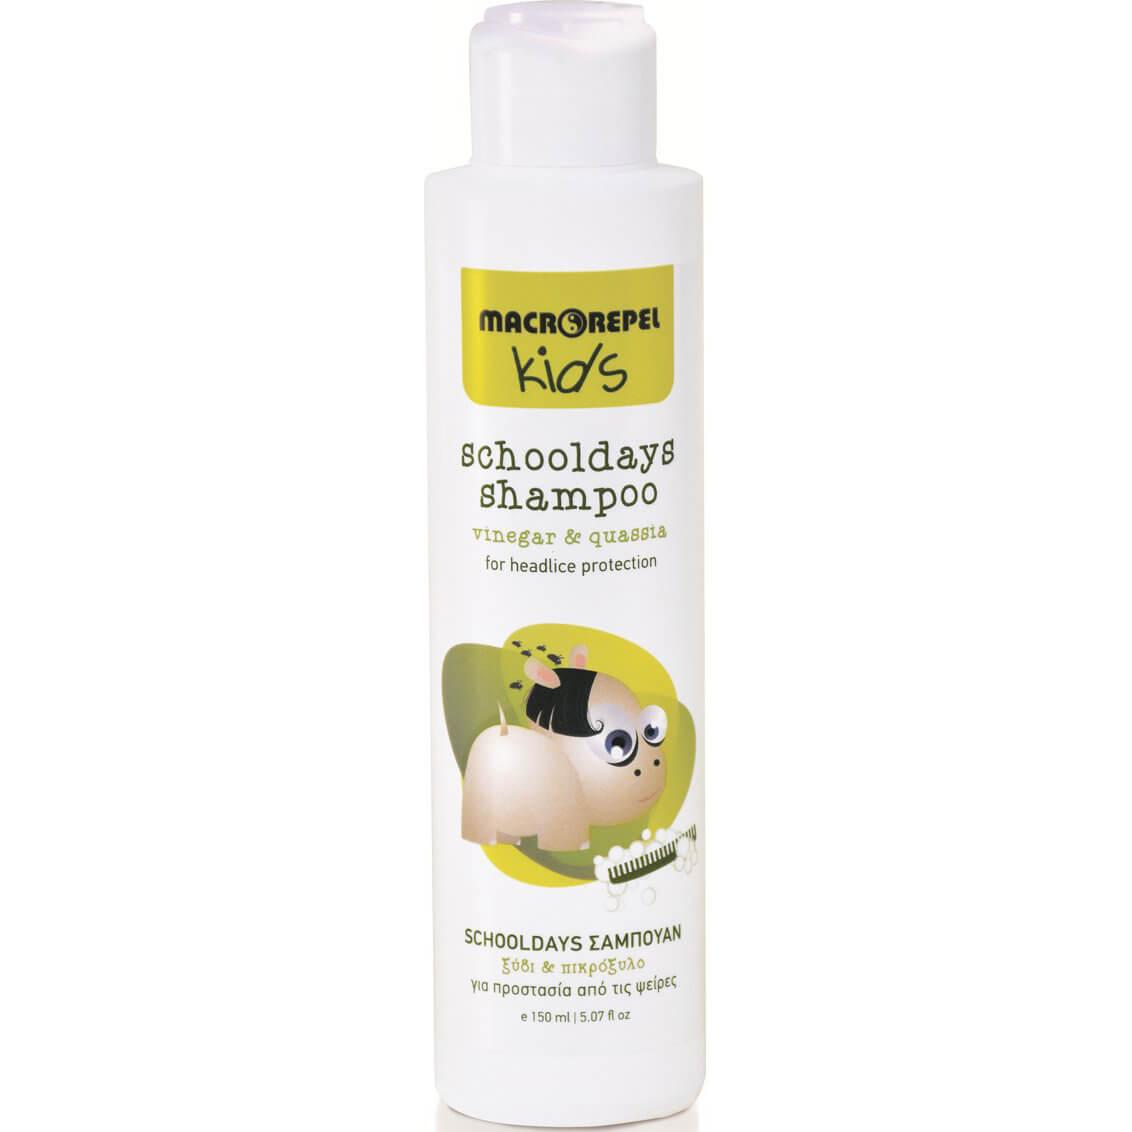 Macrovita Macrorepel Kids Schooldays Shampoo Σαμπουάν για Προστασία από τις Ψείρες με Ξύδι και Πικρόξυλο 150ml